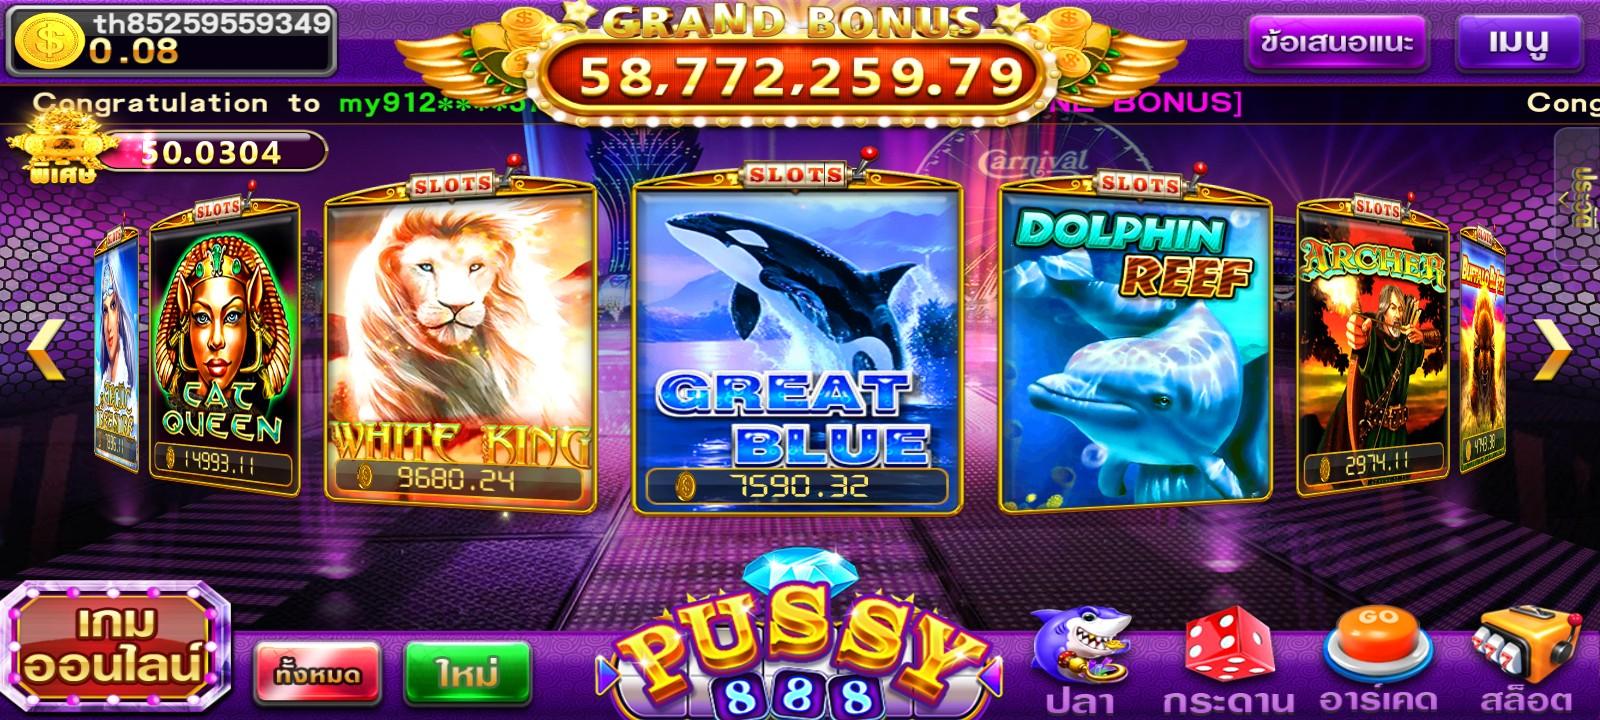 Pussy888-BIGWIN369-Great-Blue-1